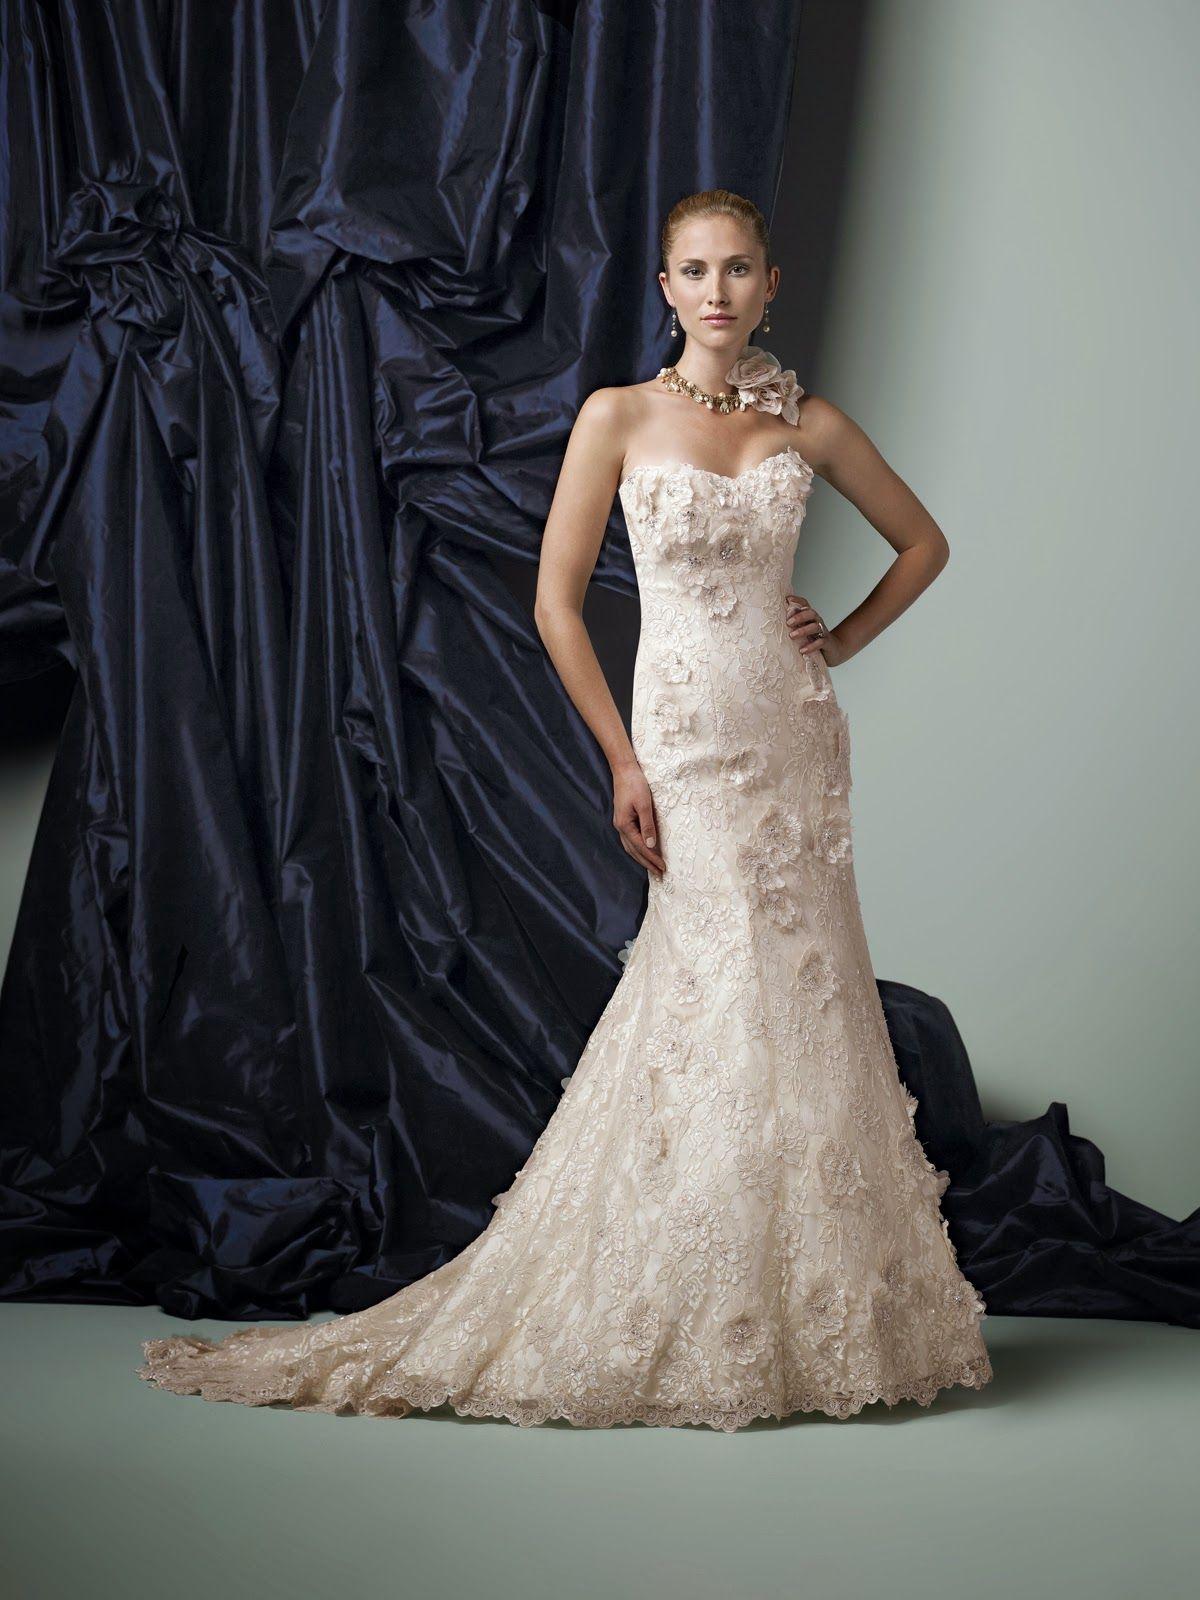 Vestido de novia corte sirena | bodatotal.com | wedding ideas ...